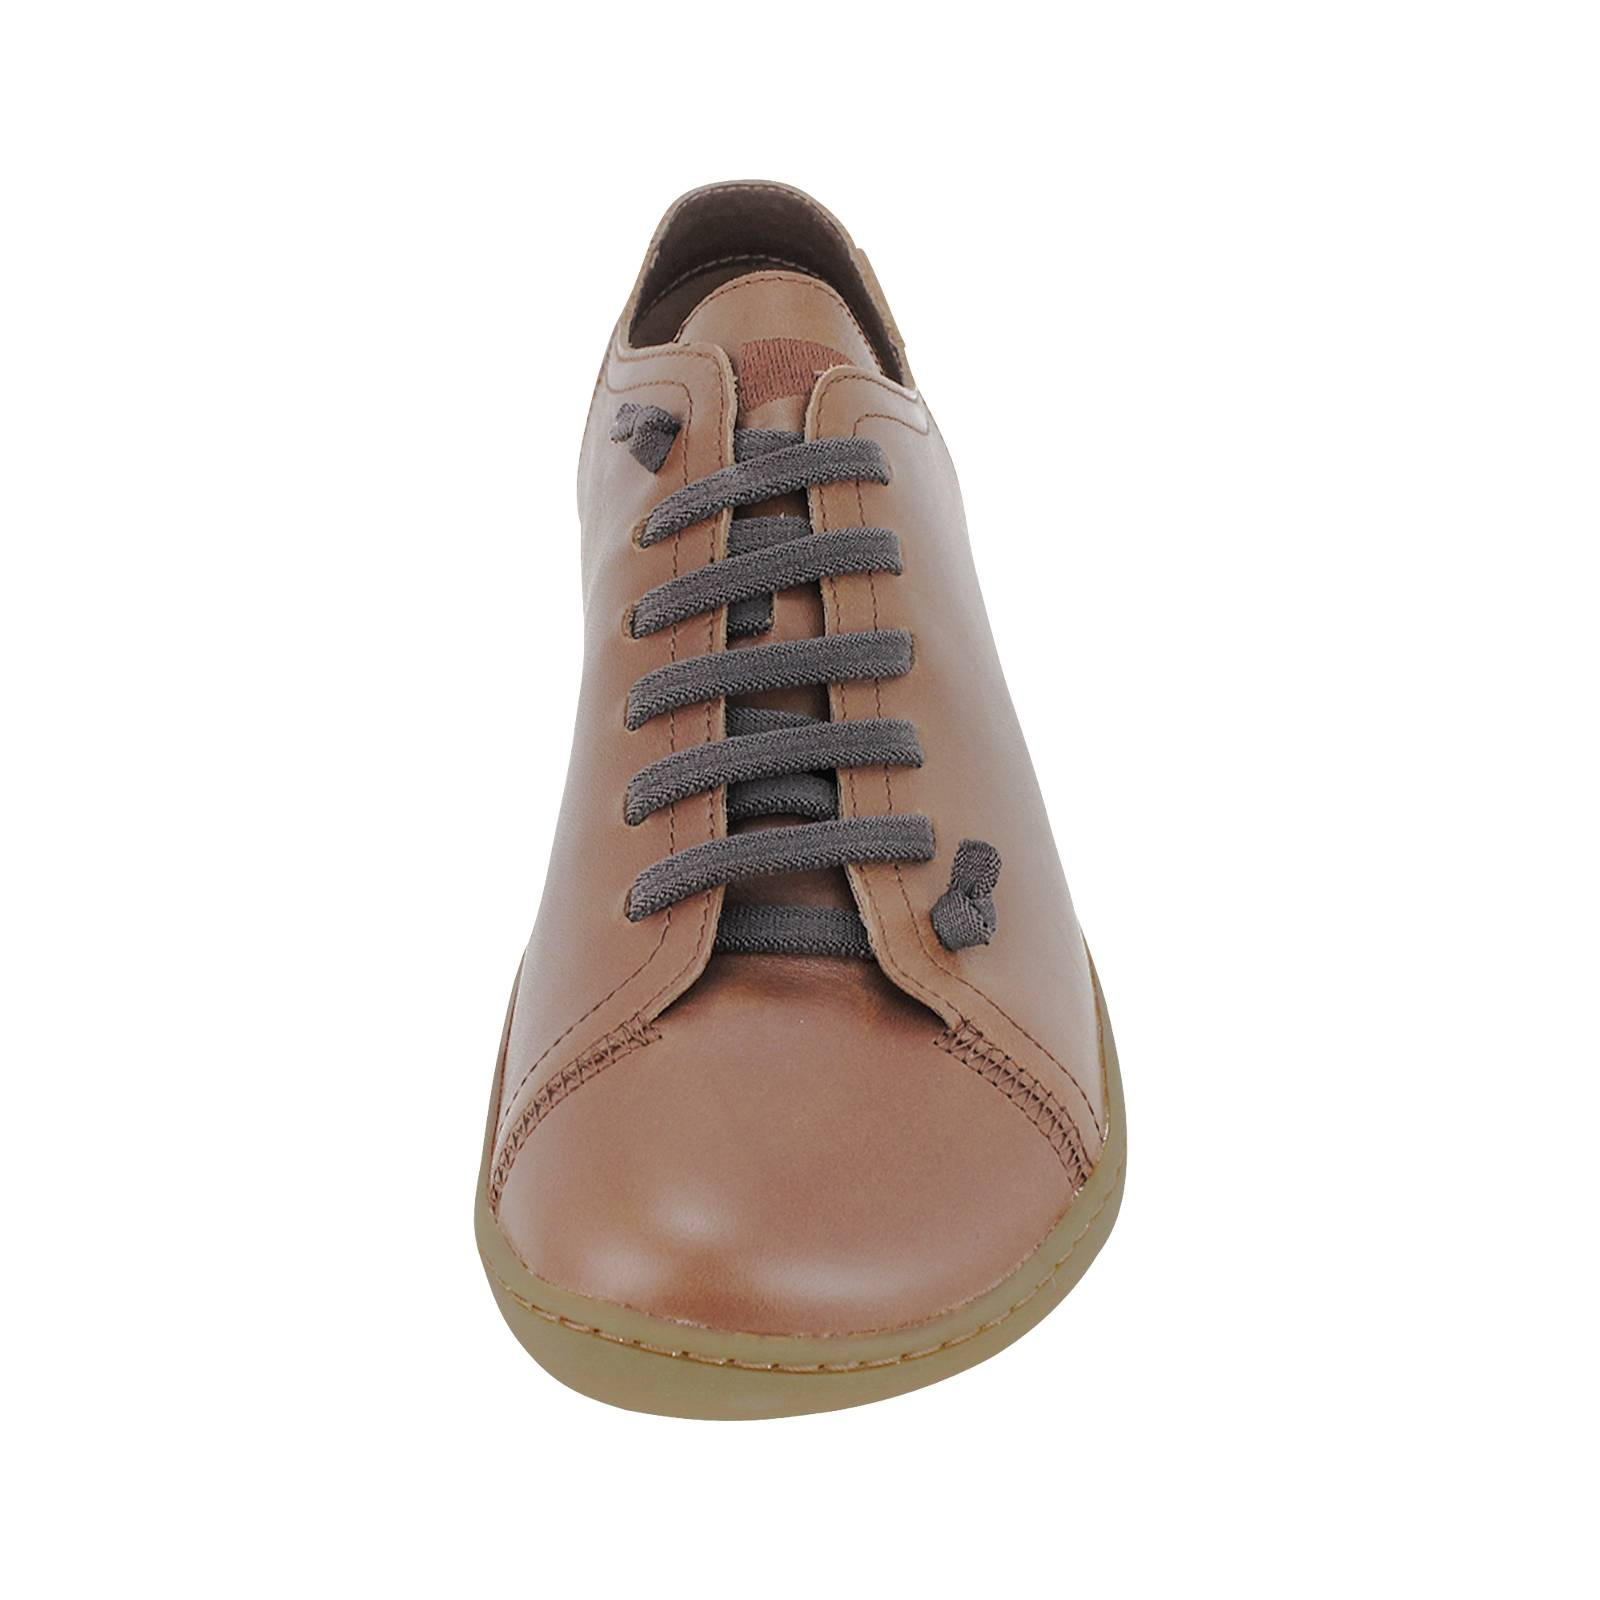 295e2a986d Peu Cami - Ανδρικά παπούτσια casual Camper από δέρμα - Gianna ...